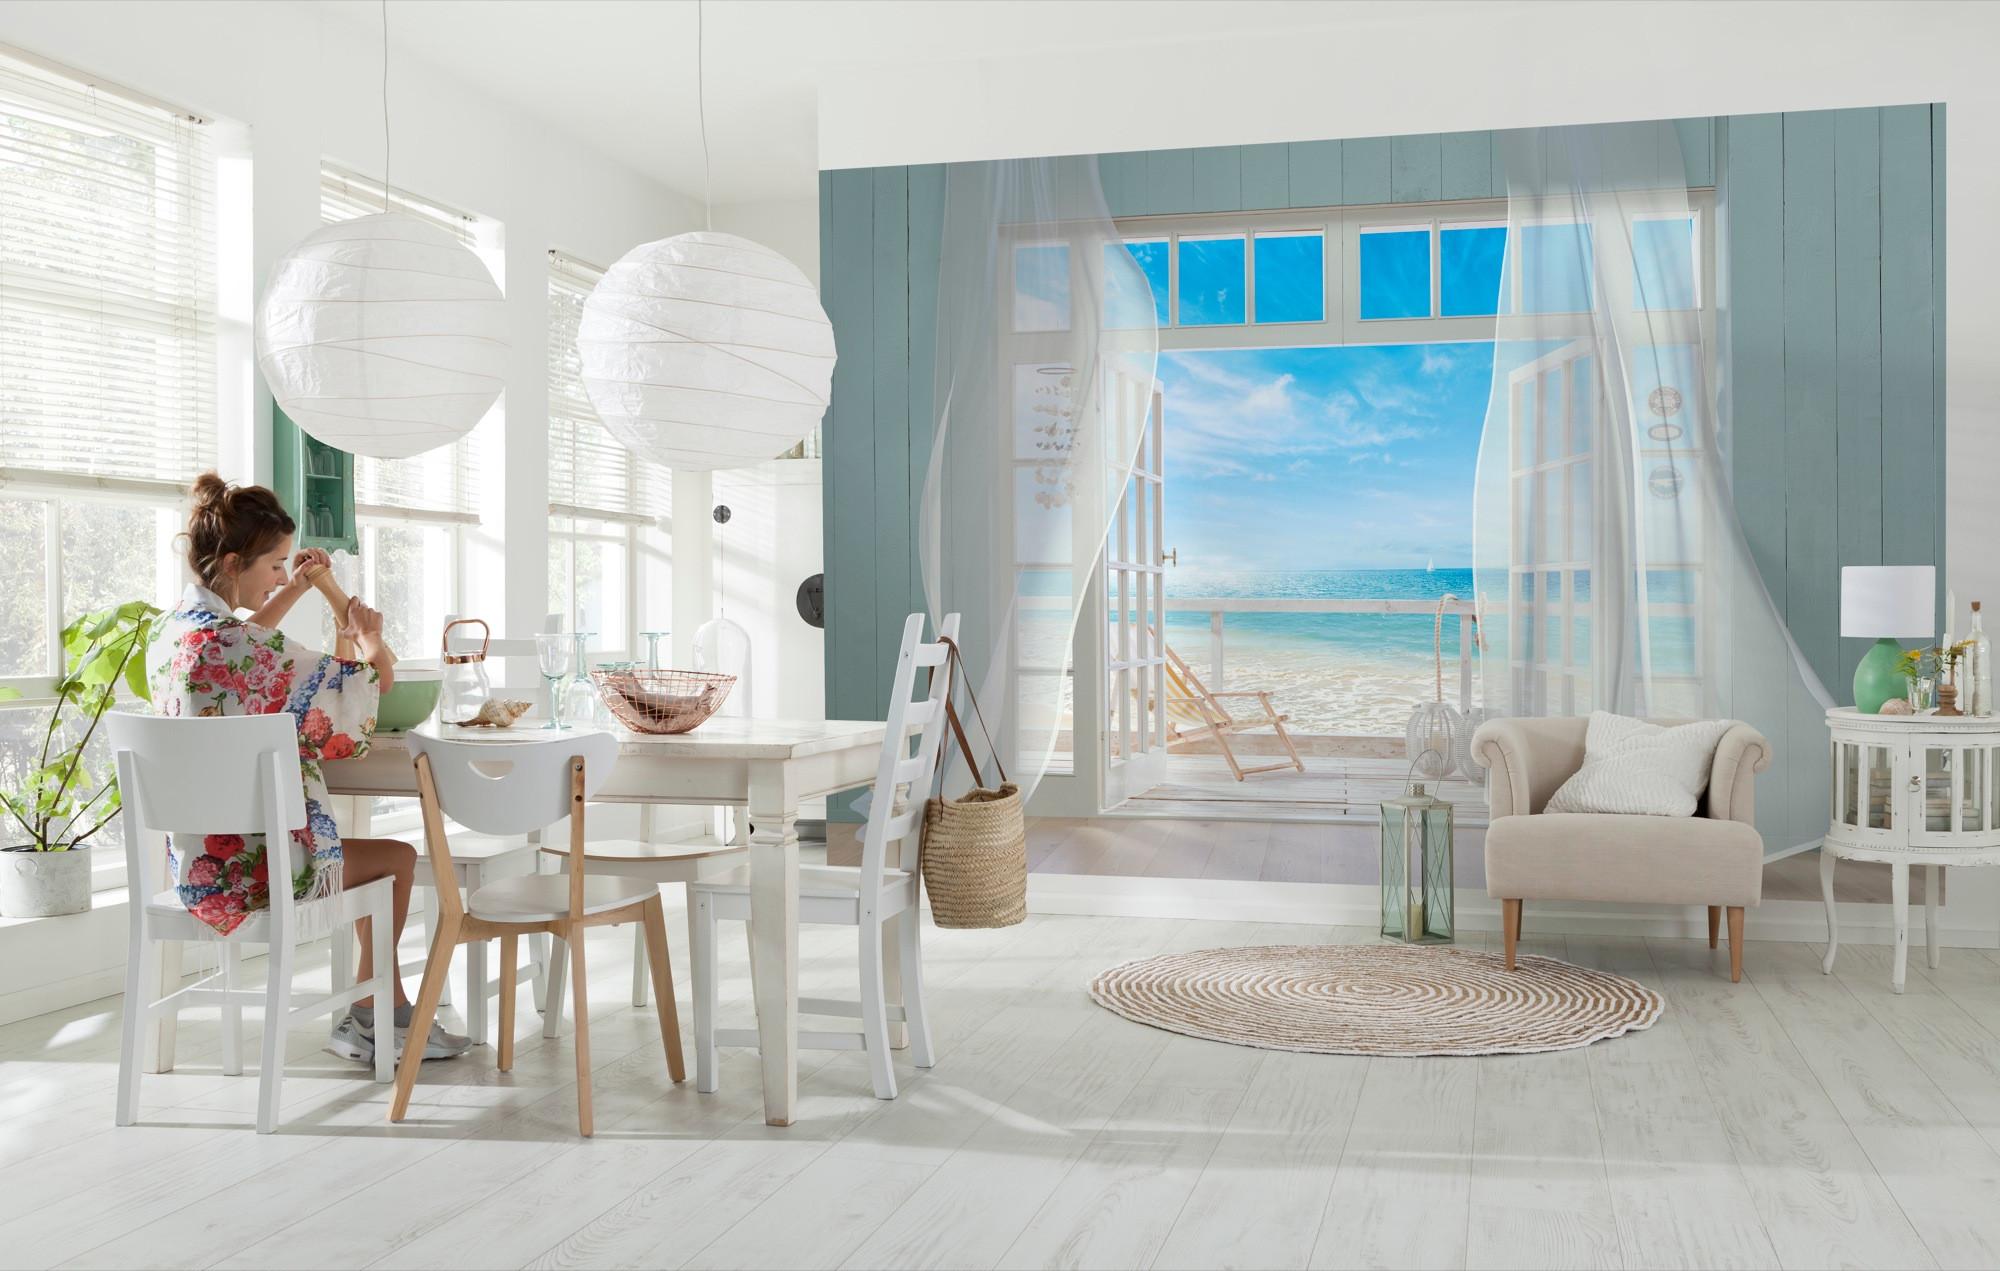 fototapete malibu von komar. Black Bedroom Furniture Sets. Home Design Ideas